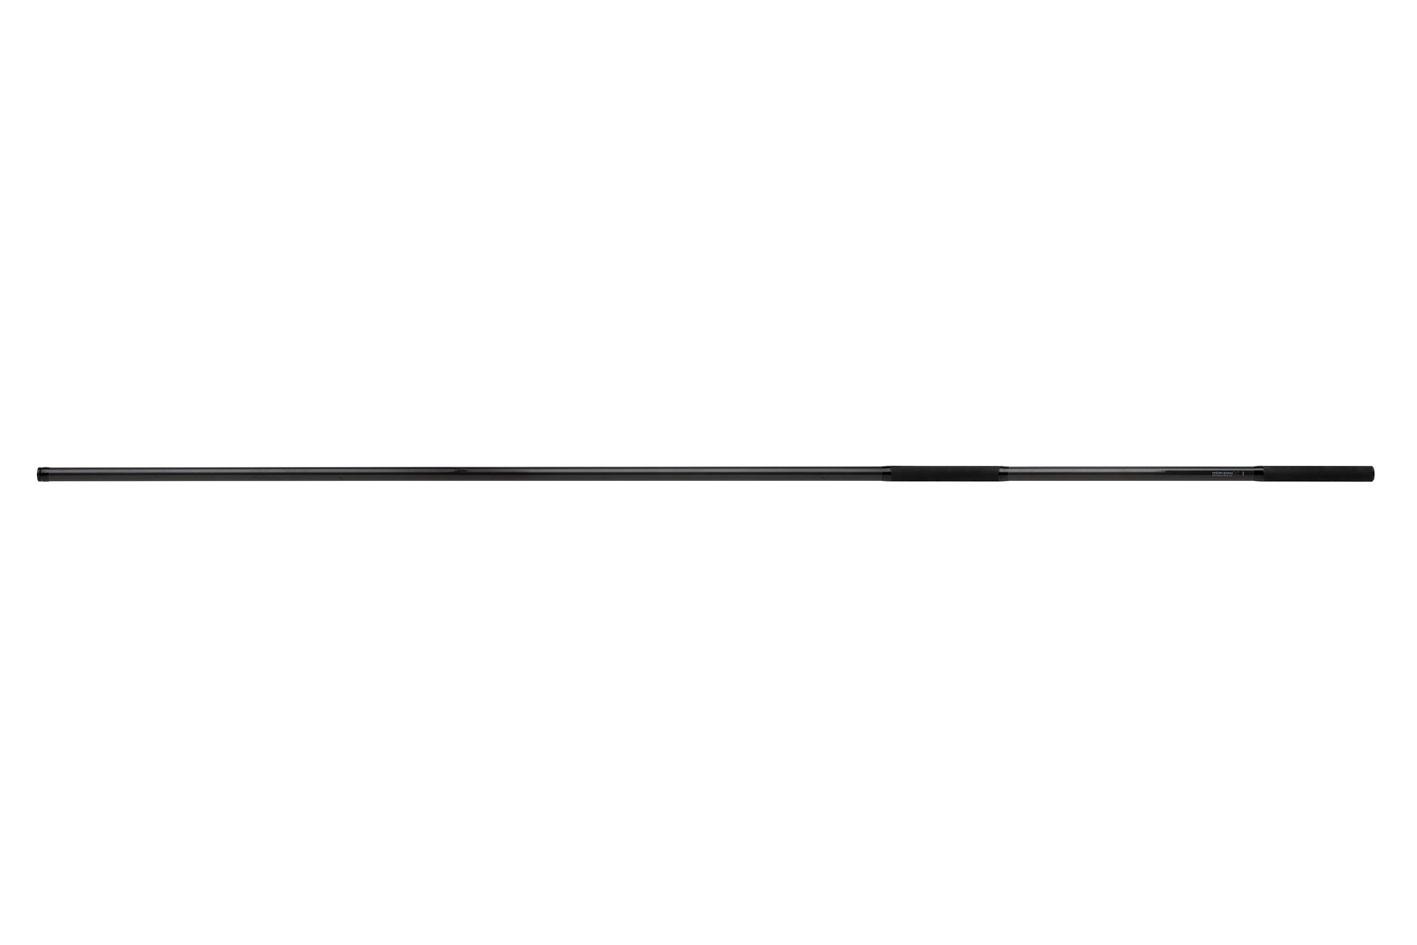 horizon-x-distance-pole_6ft_maingif